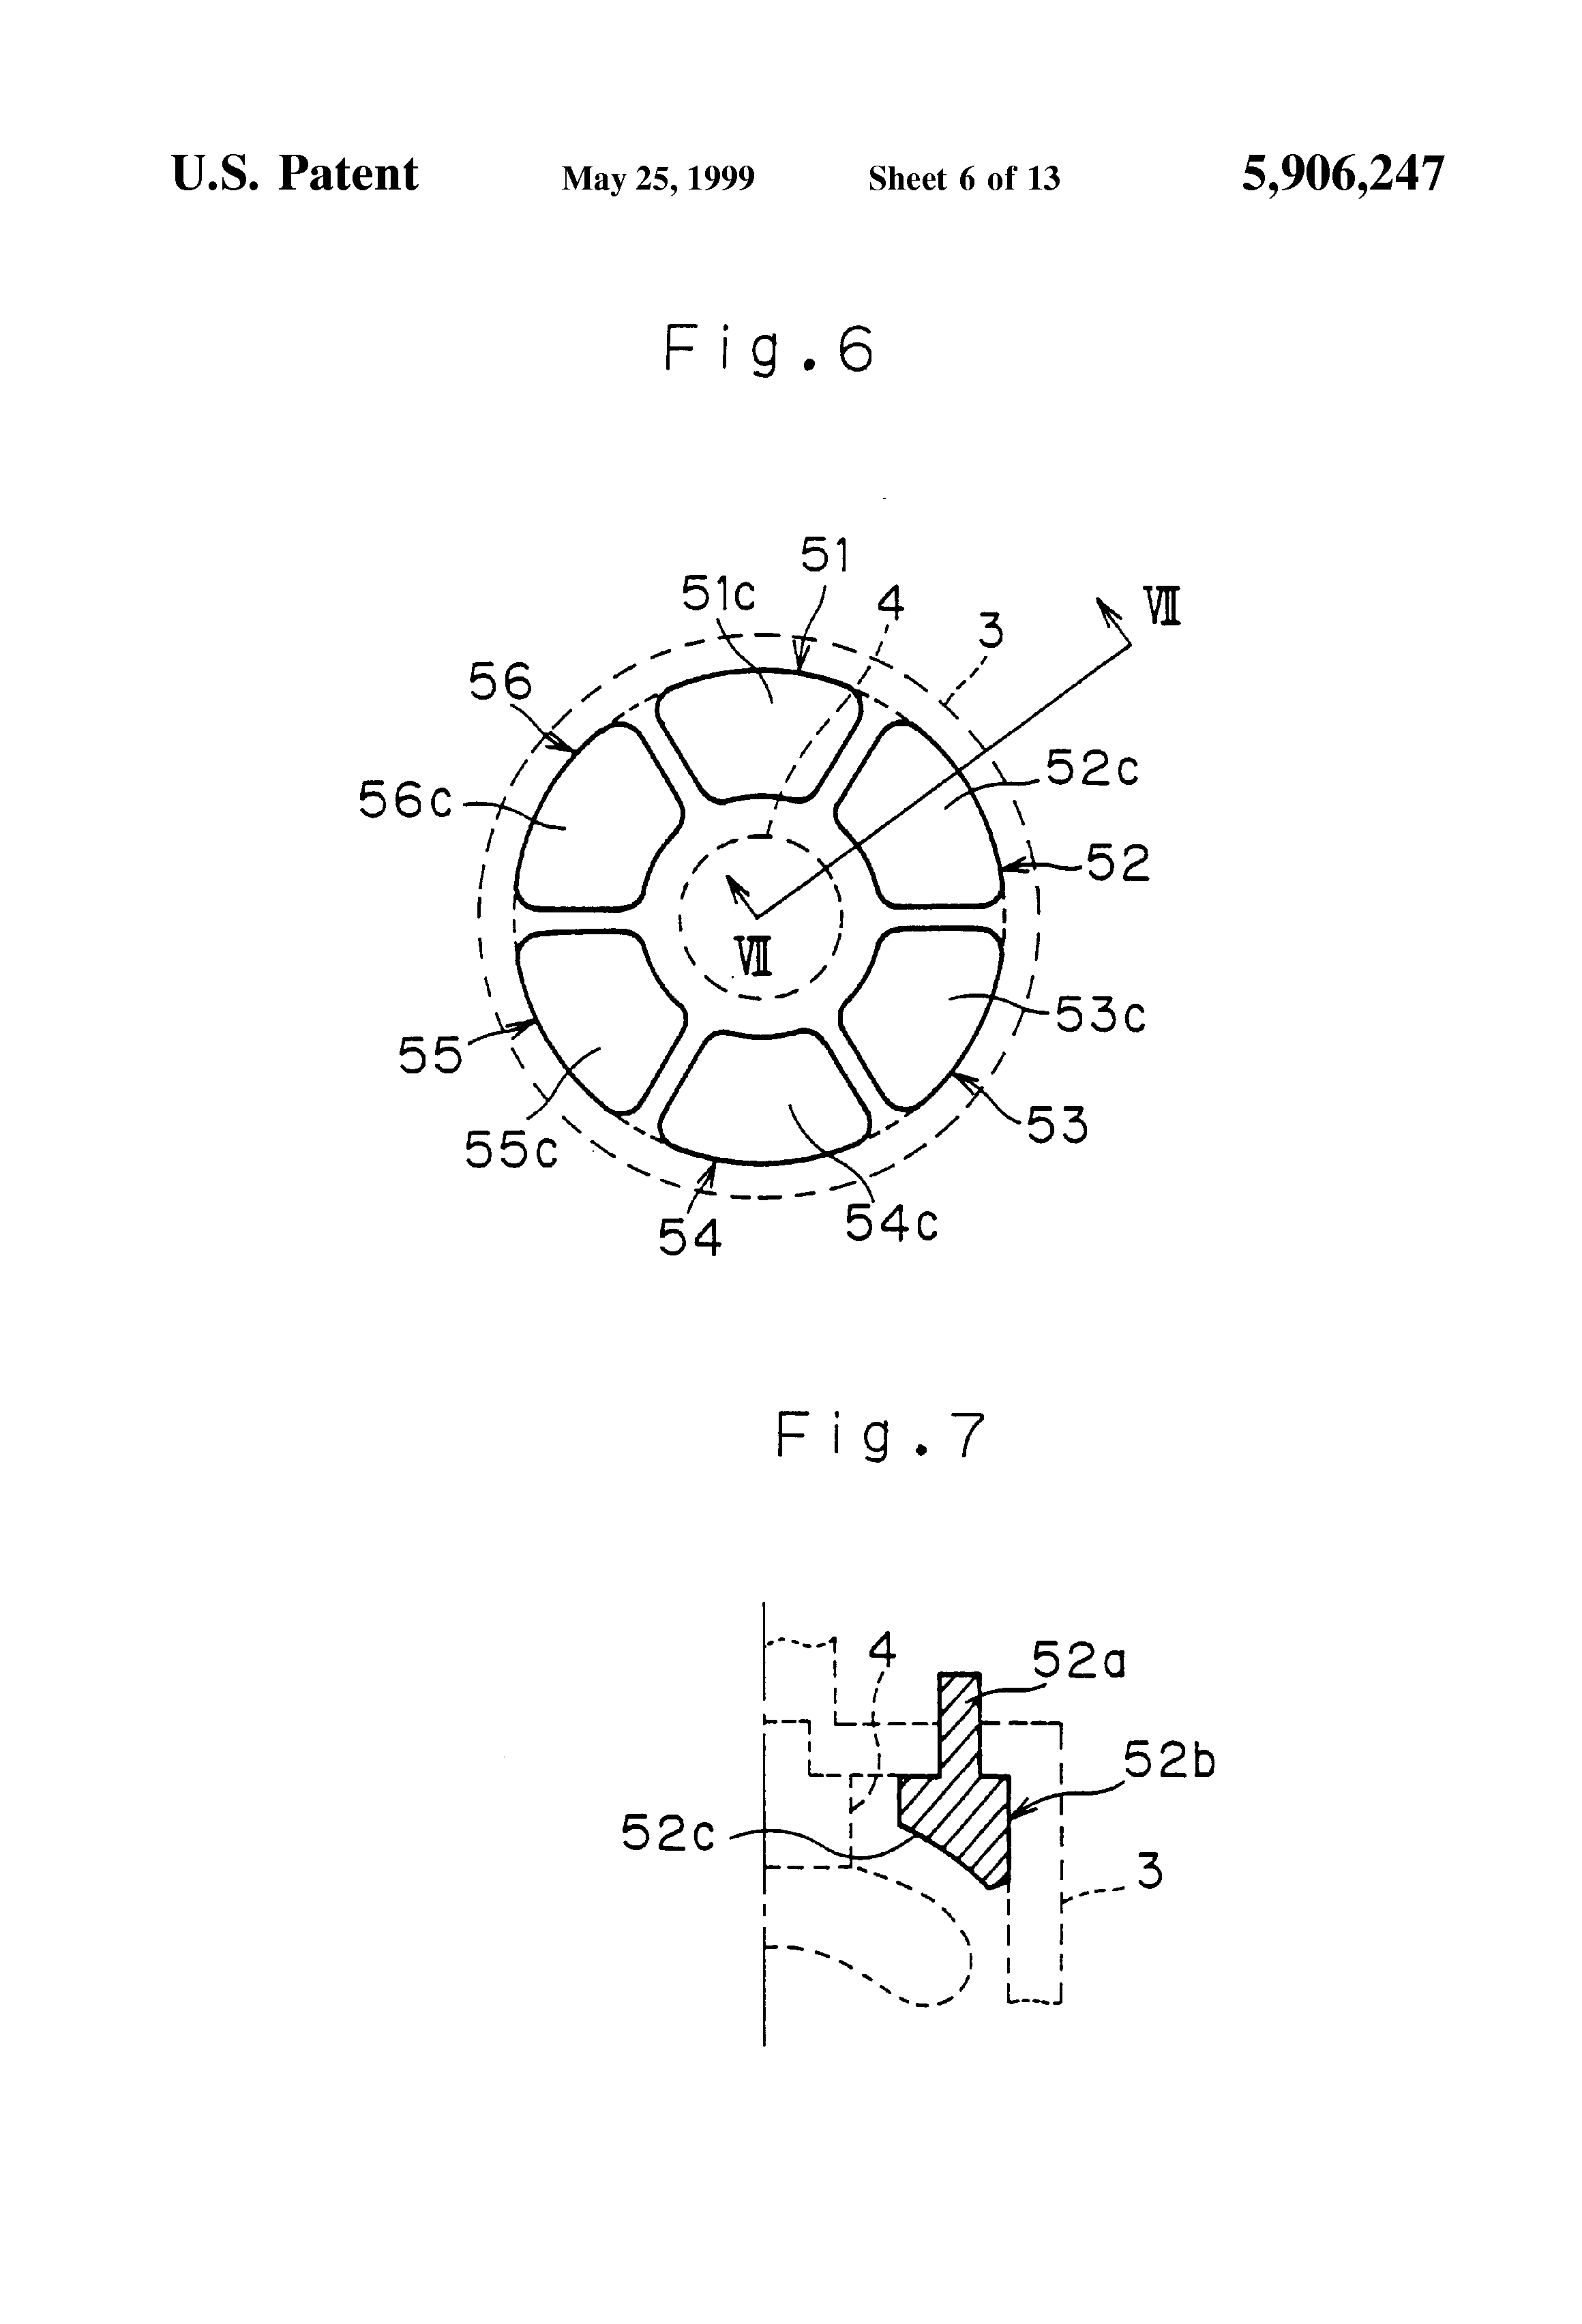 Motorised Valve Wiring Diagram Dkz Zkz Skz Linear Electric Actuator Mov Rotork Explained